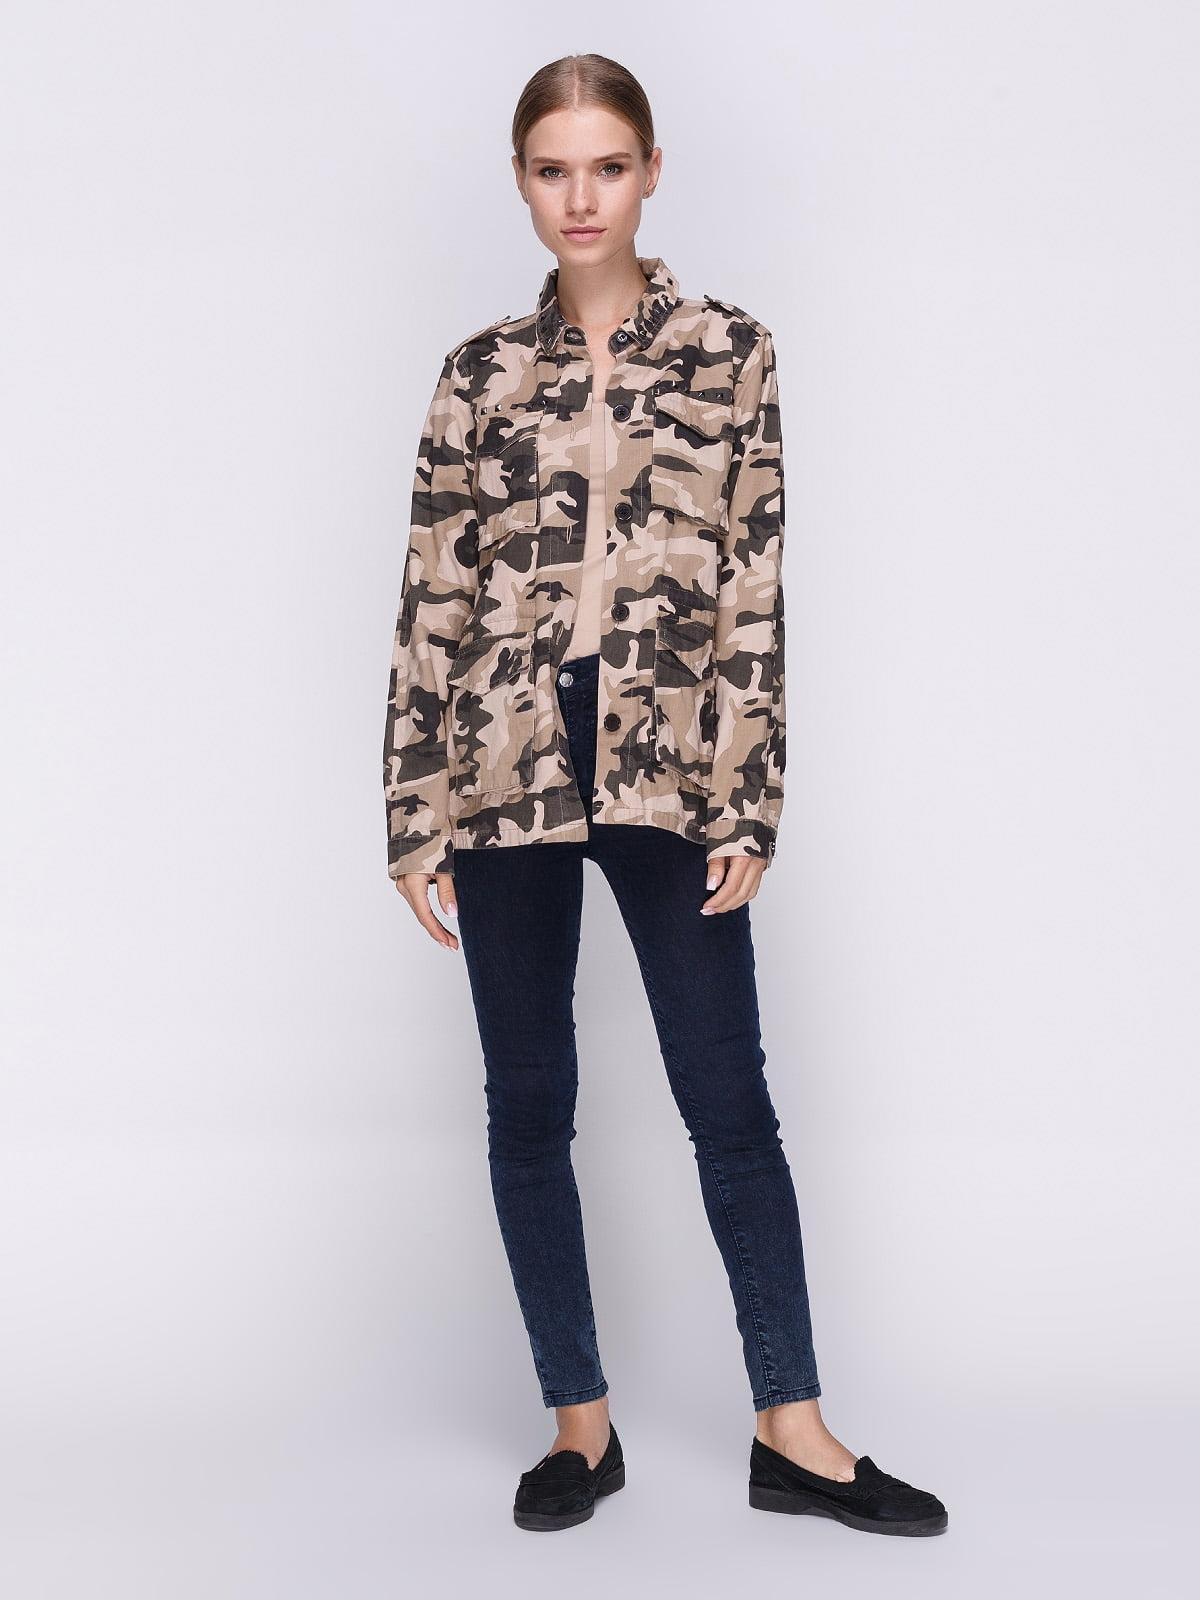 Куртка камуфляжного забарвлення | 3967002 | фото 2